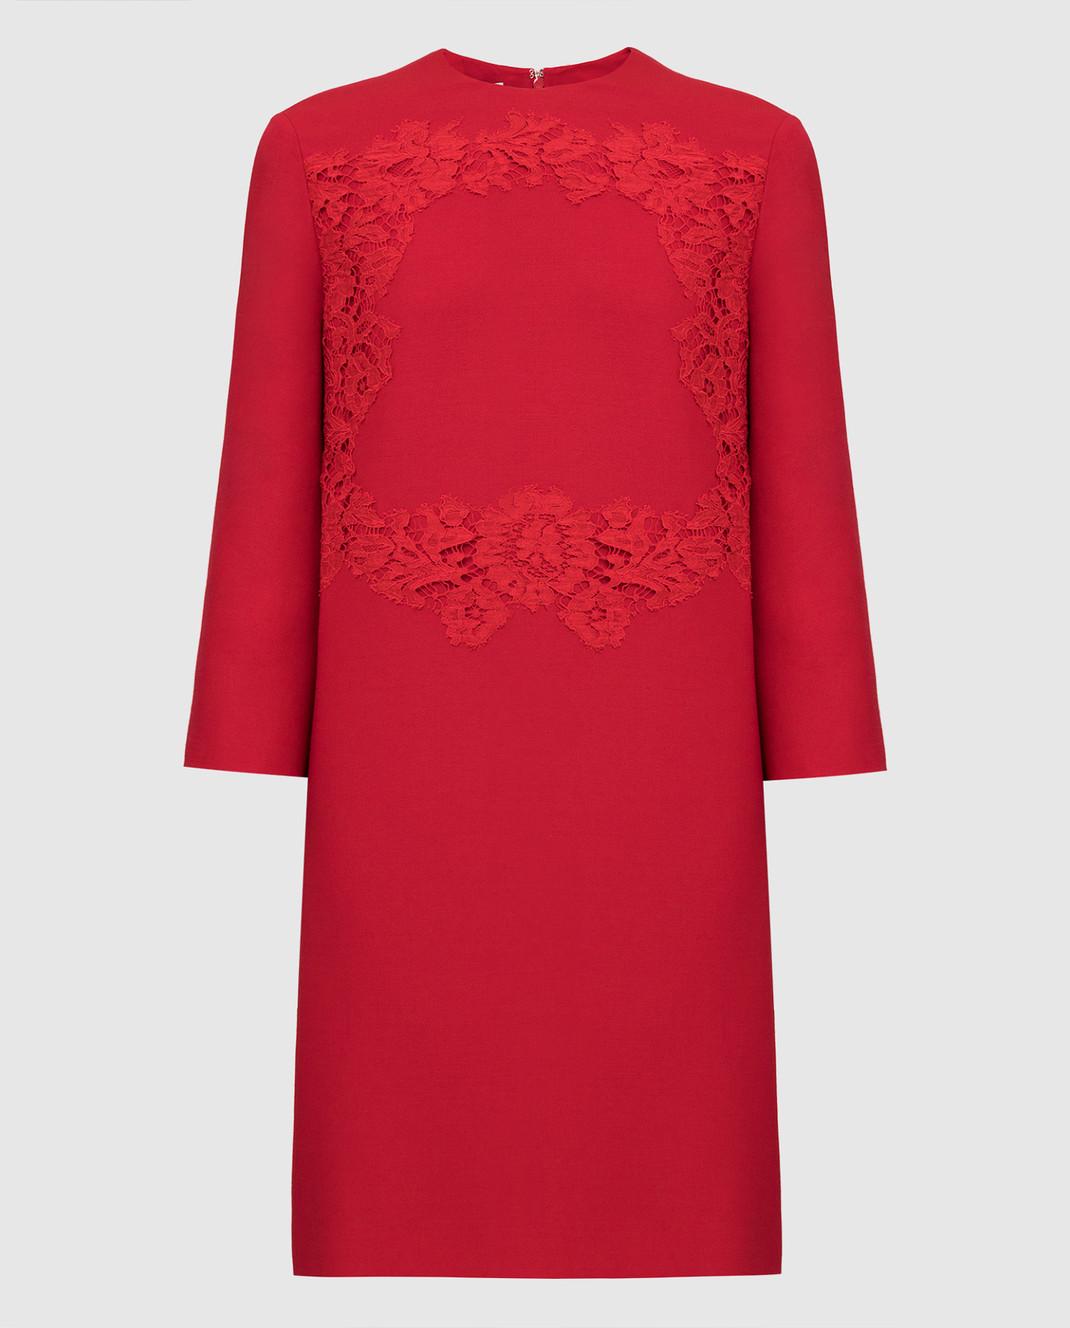 Valentino Красное платье из шерсти и шелка SB0VAPN0360